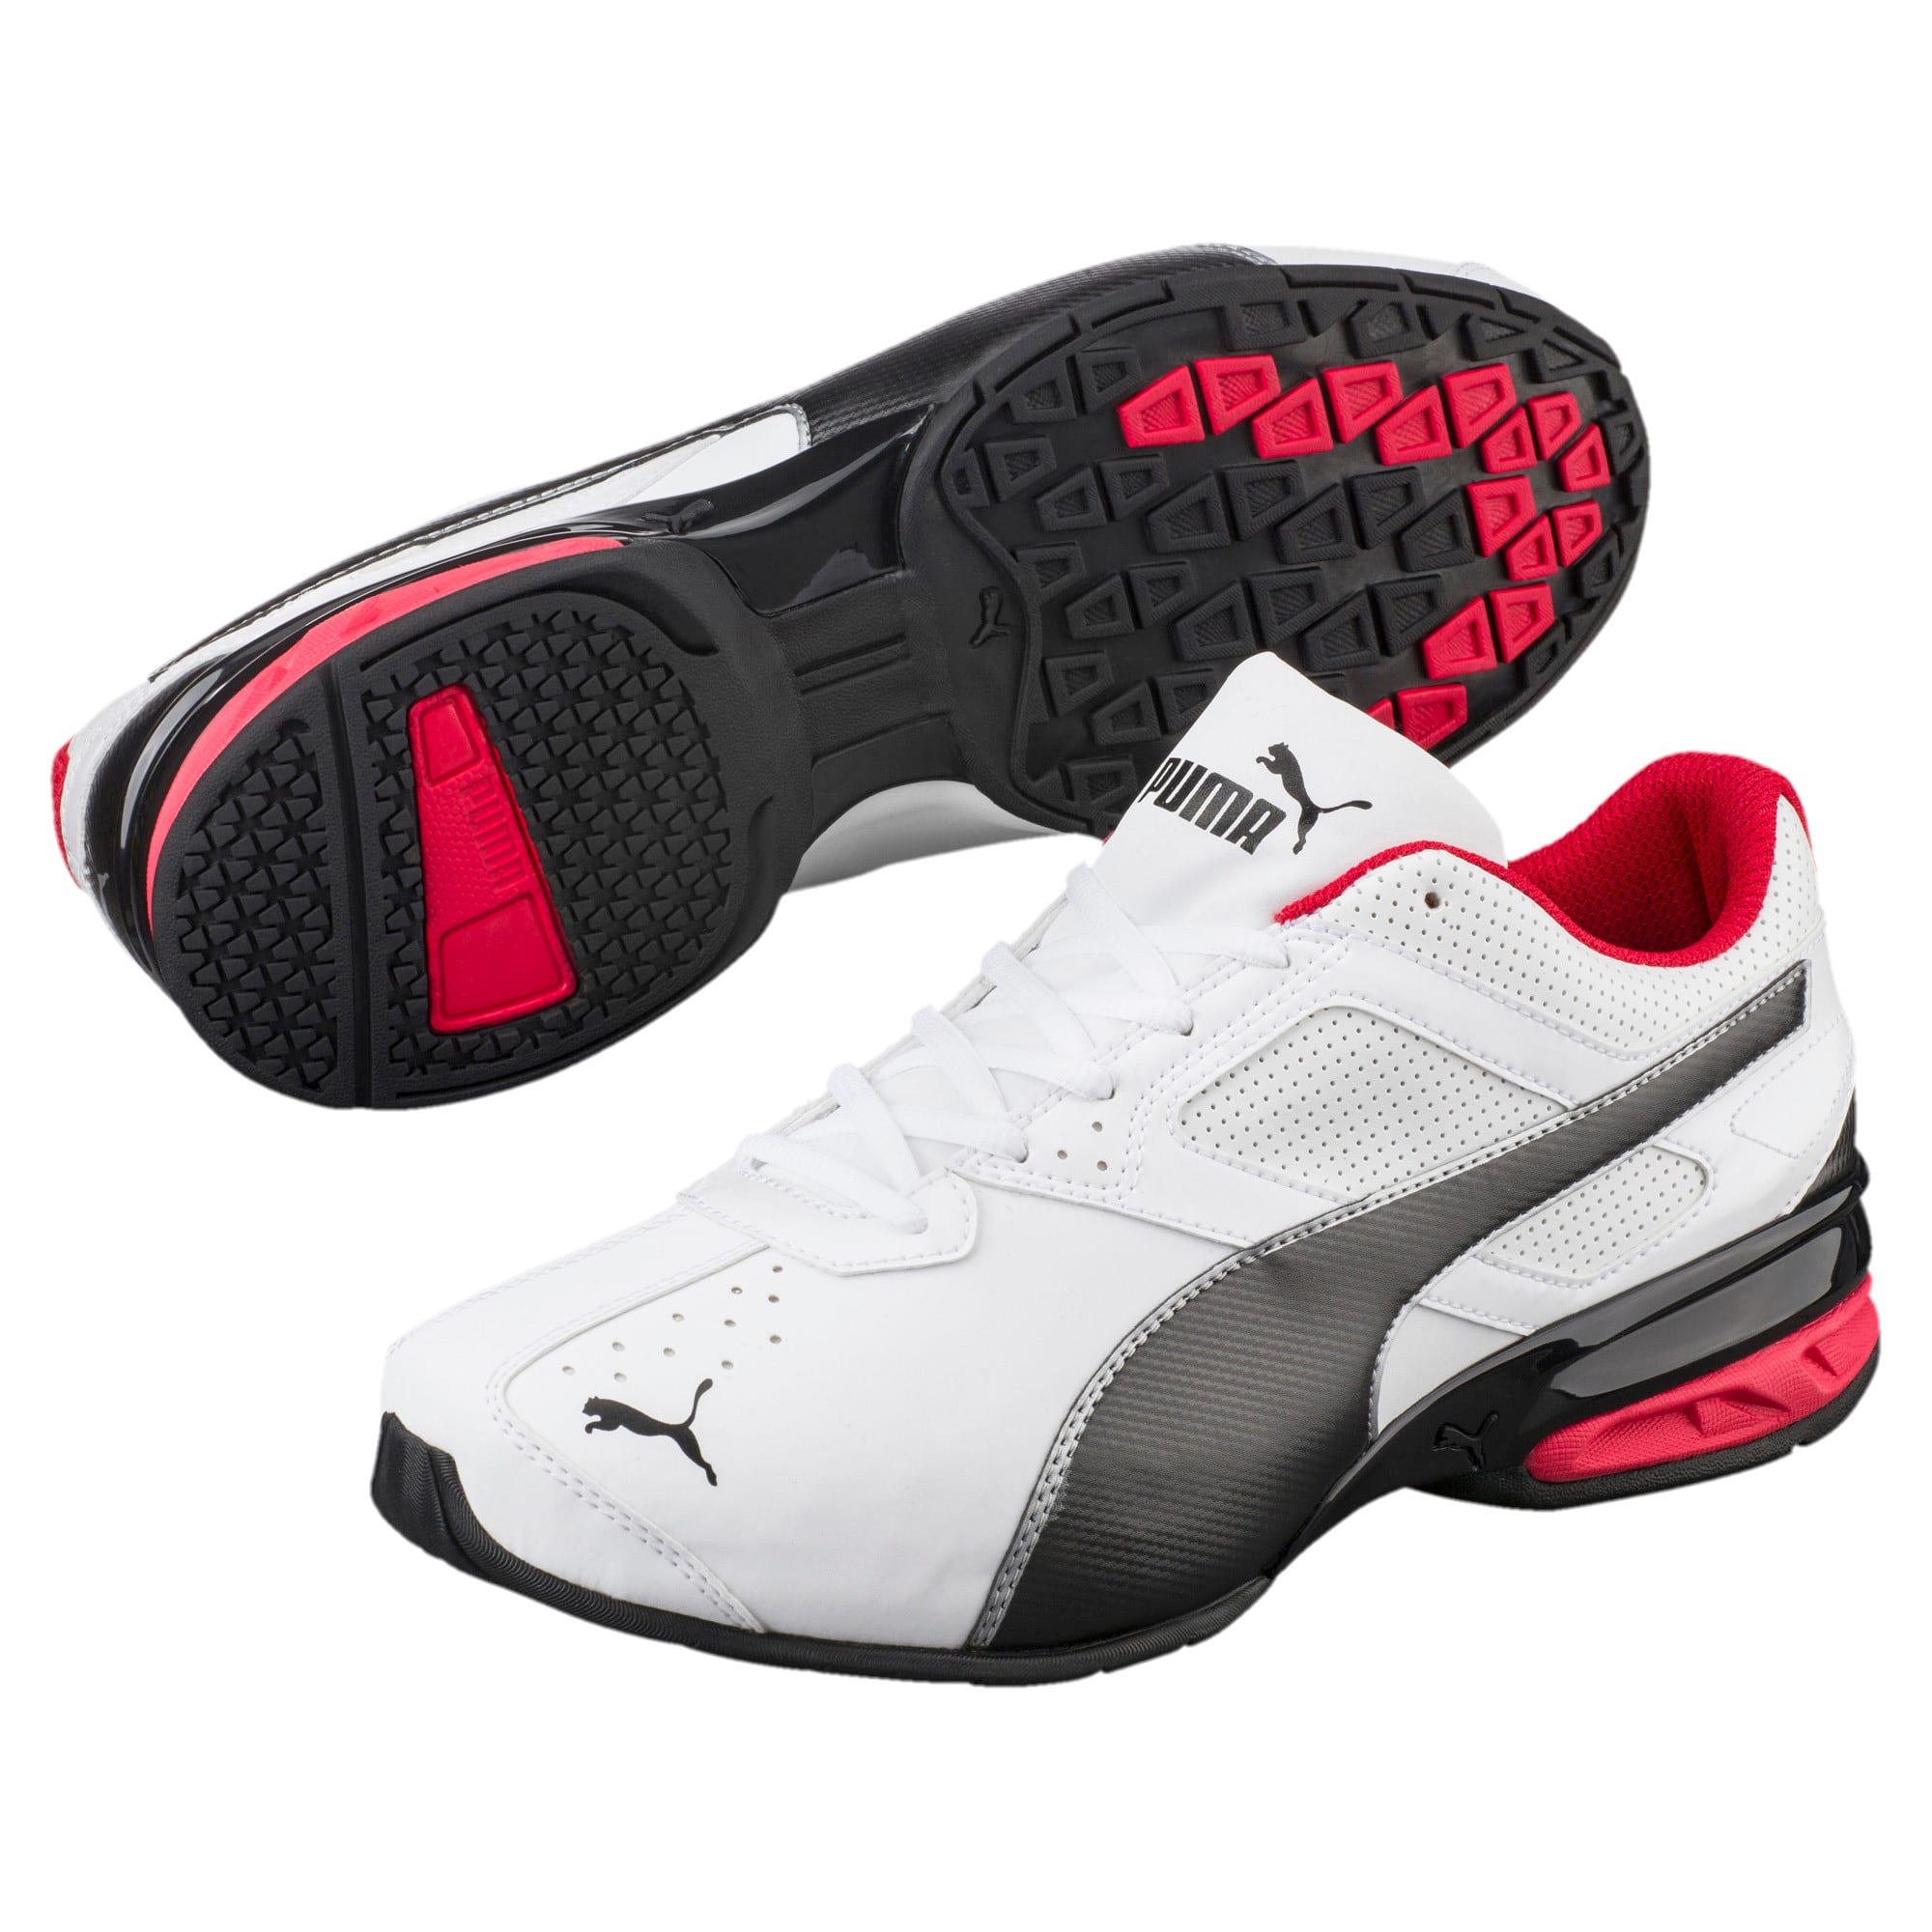 Thumbnail 2 of Tazon 6 FM Wide Men's Sneakers, White-Black-puma silver, medium